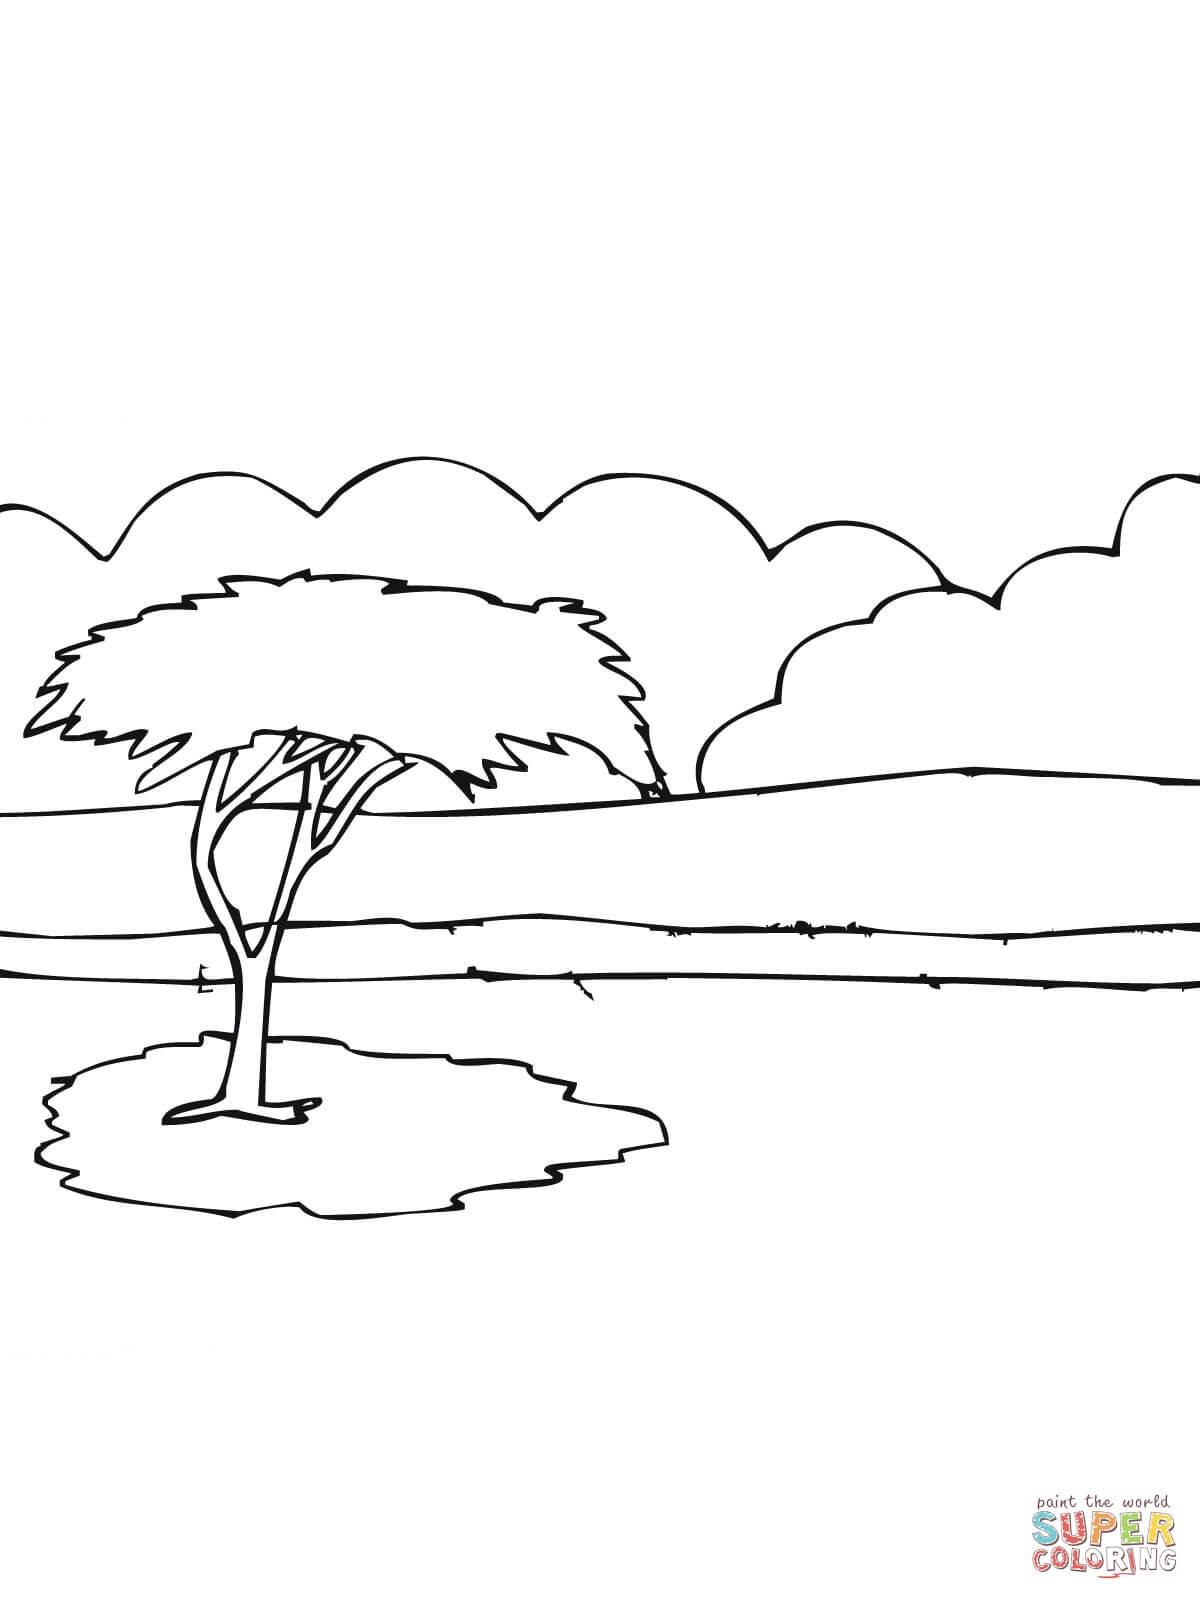 Desenhar Planta Online African Acacia Tree Coloring Page Free Printable